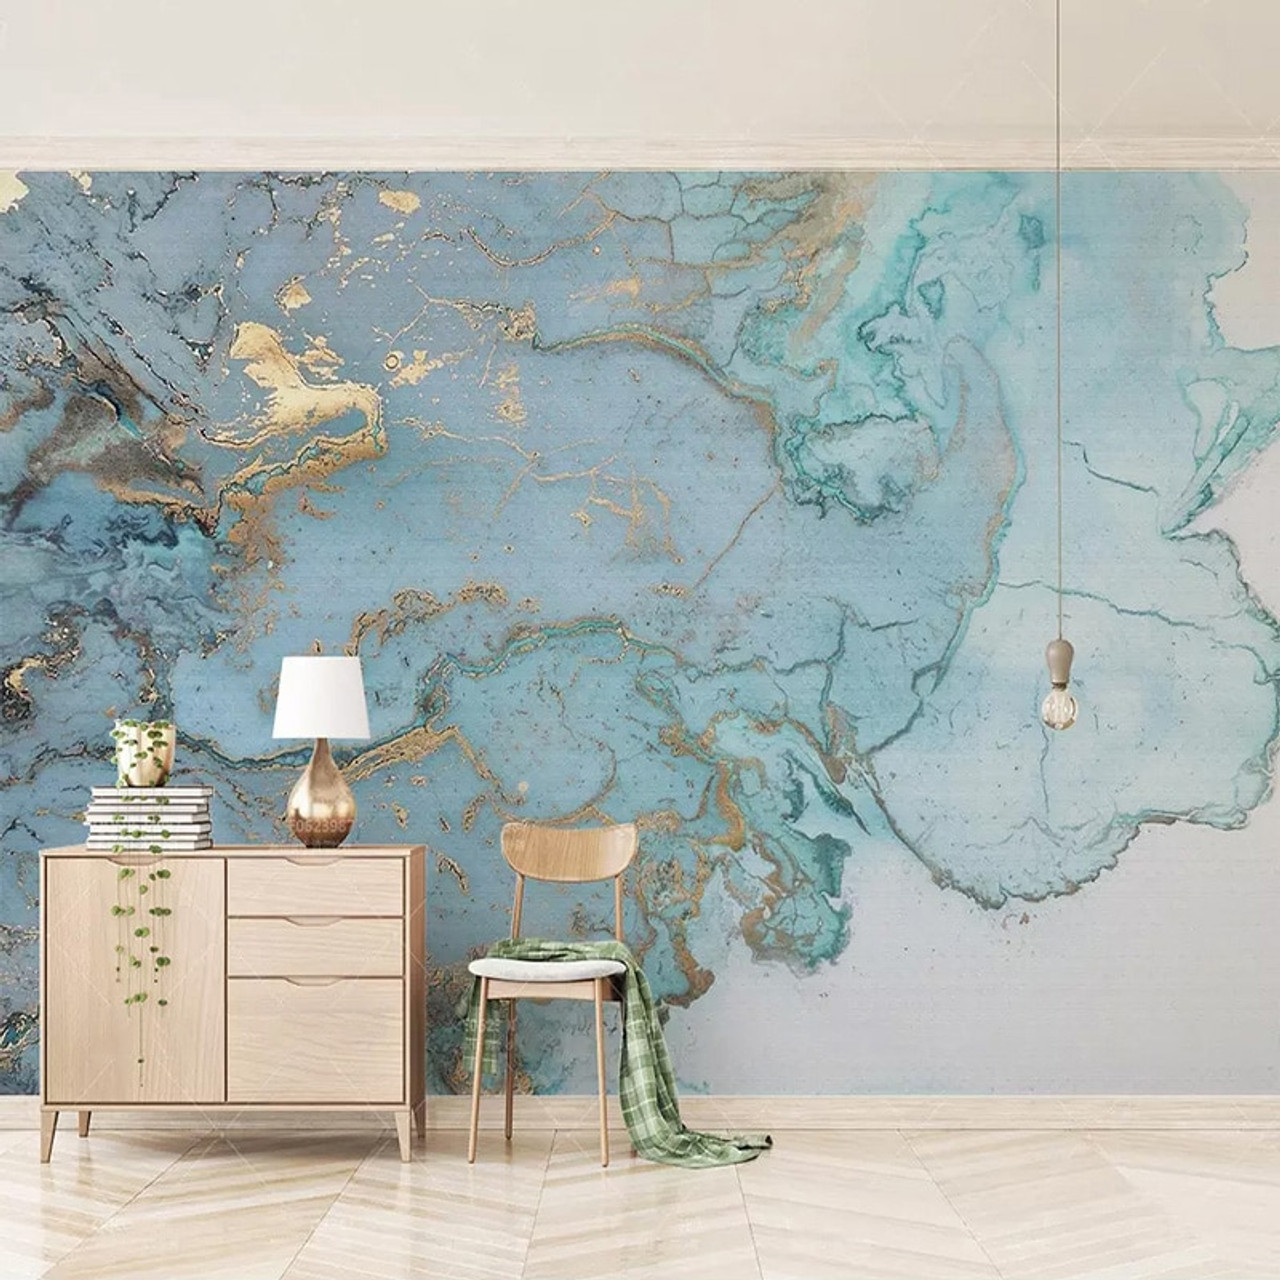 Custom Photo Wallpapers 3d Stereo Blue Texture Marble Wall Paper Murals Living Room Tv Sofa Bedroom Study Decor Papel De Parede Onshopdeals Com